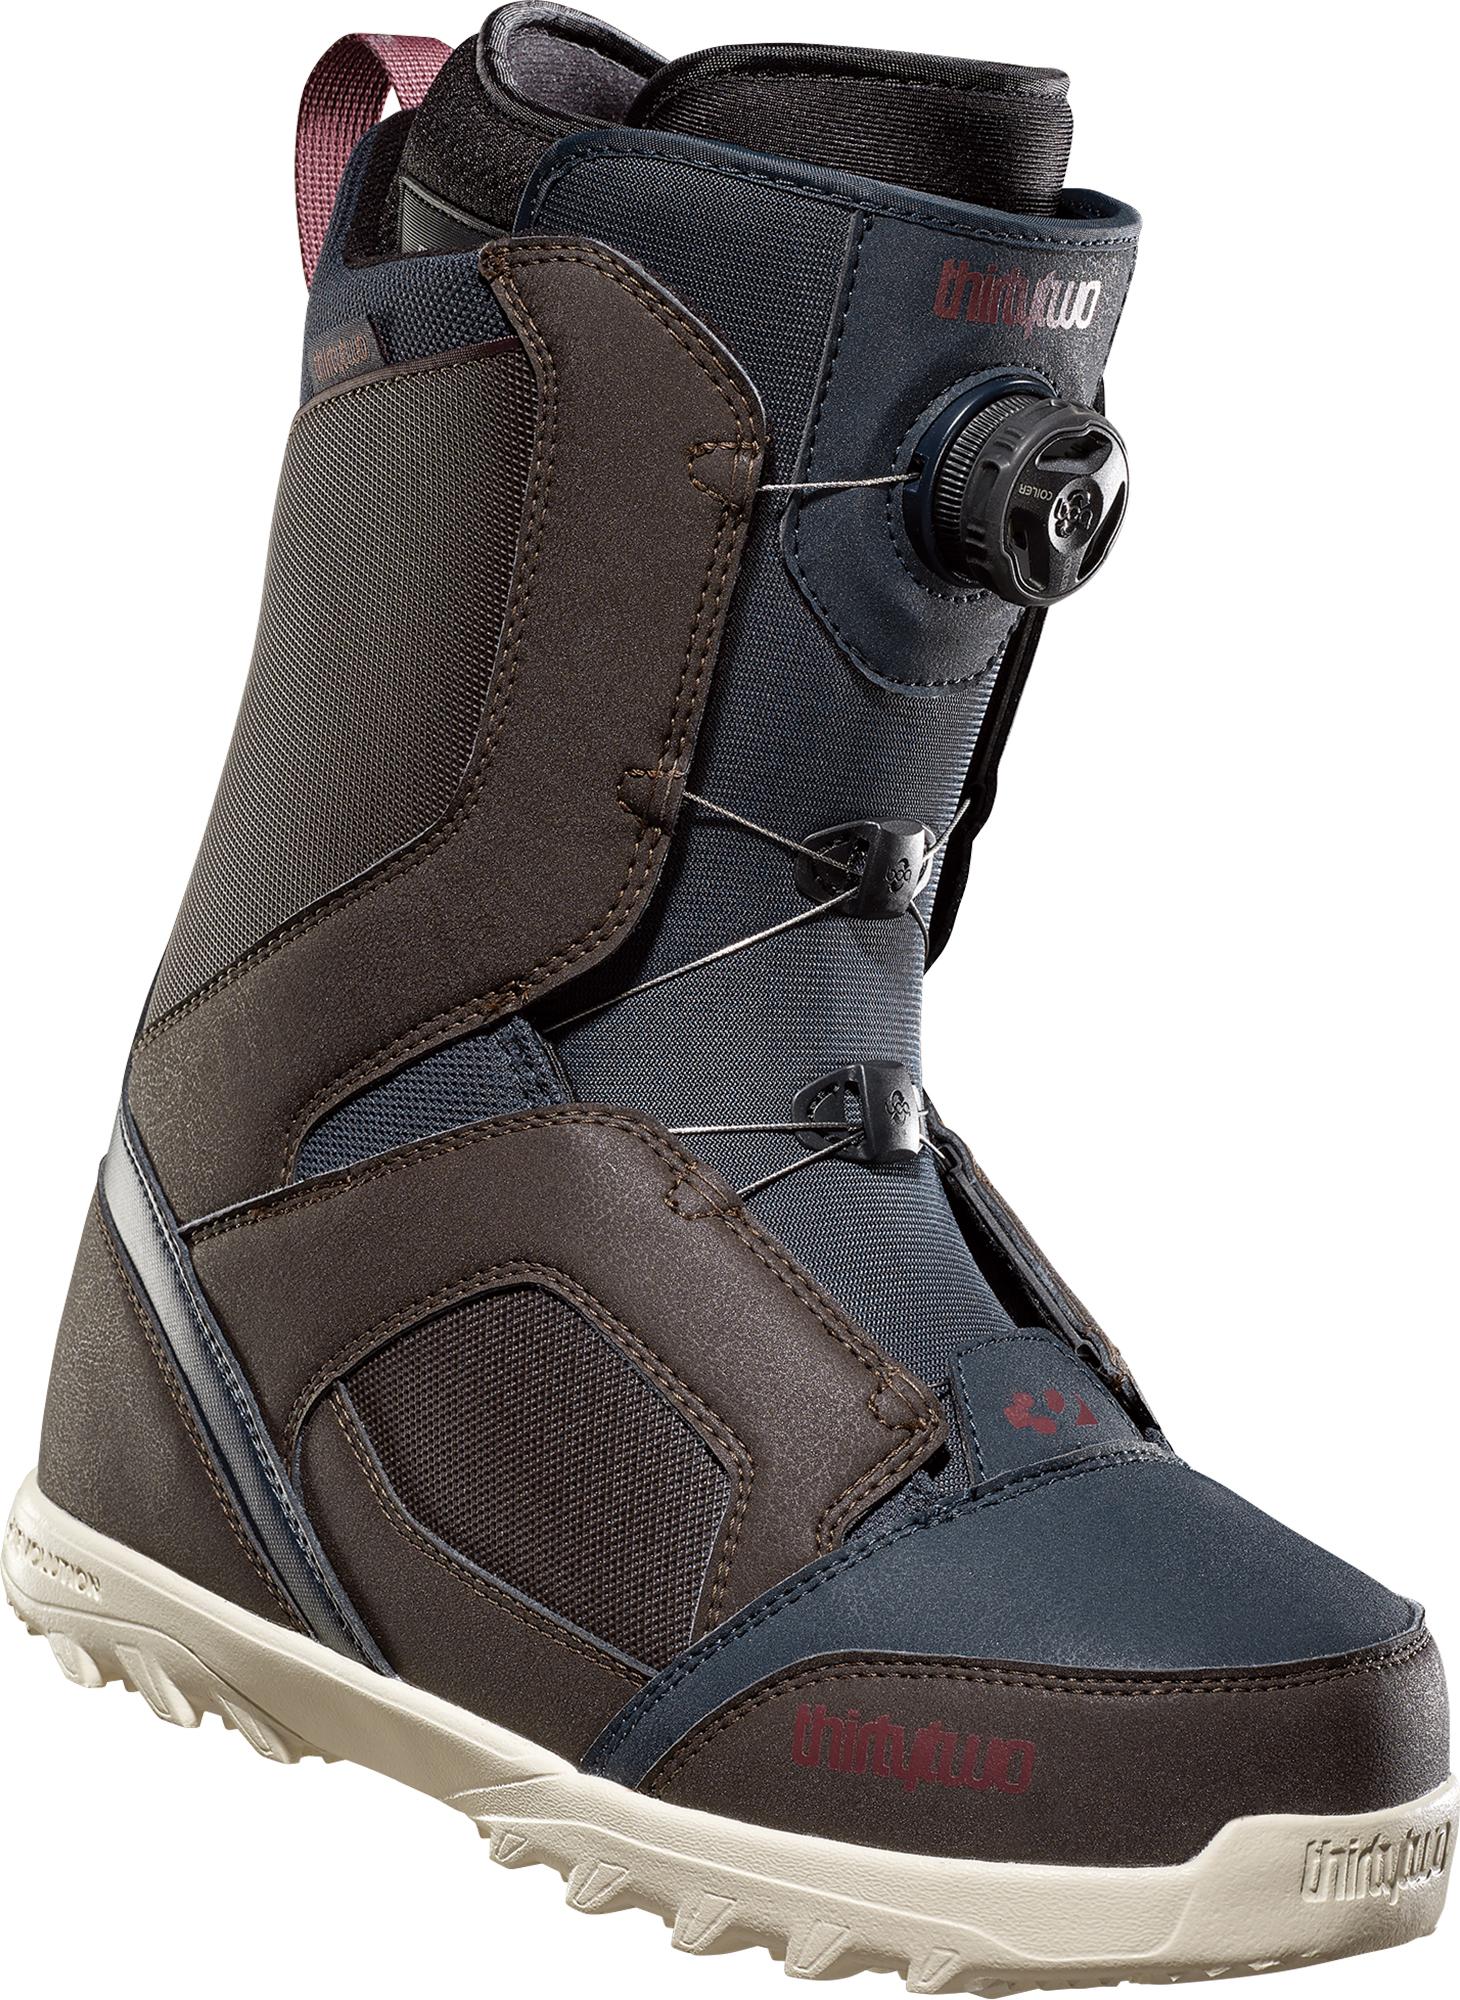 ThirtyTwo Сноубордические ботинки ThirtyTwo Stw Boa '18, размер 44 сноубордические ботинки black fire splady 16 17 splady размер 37